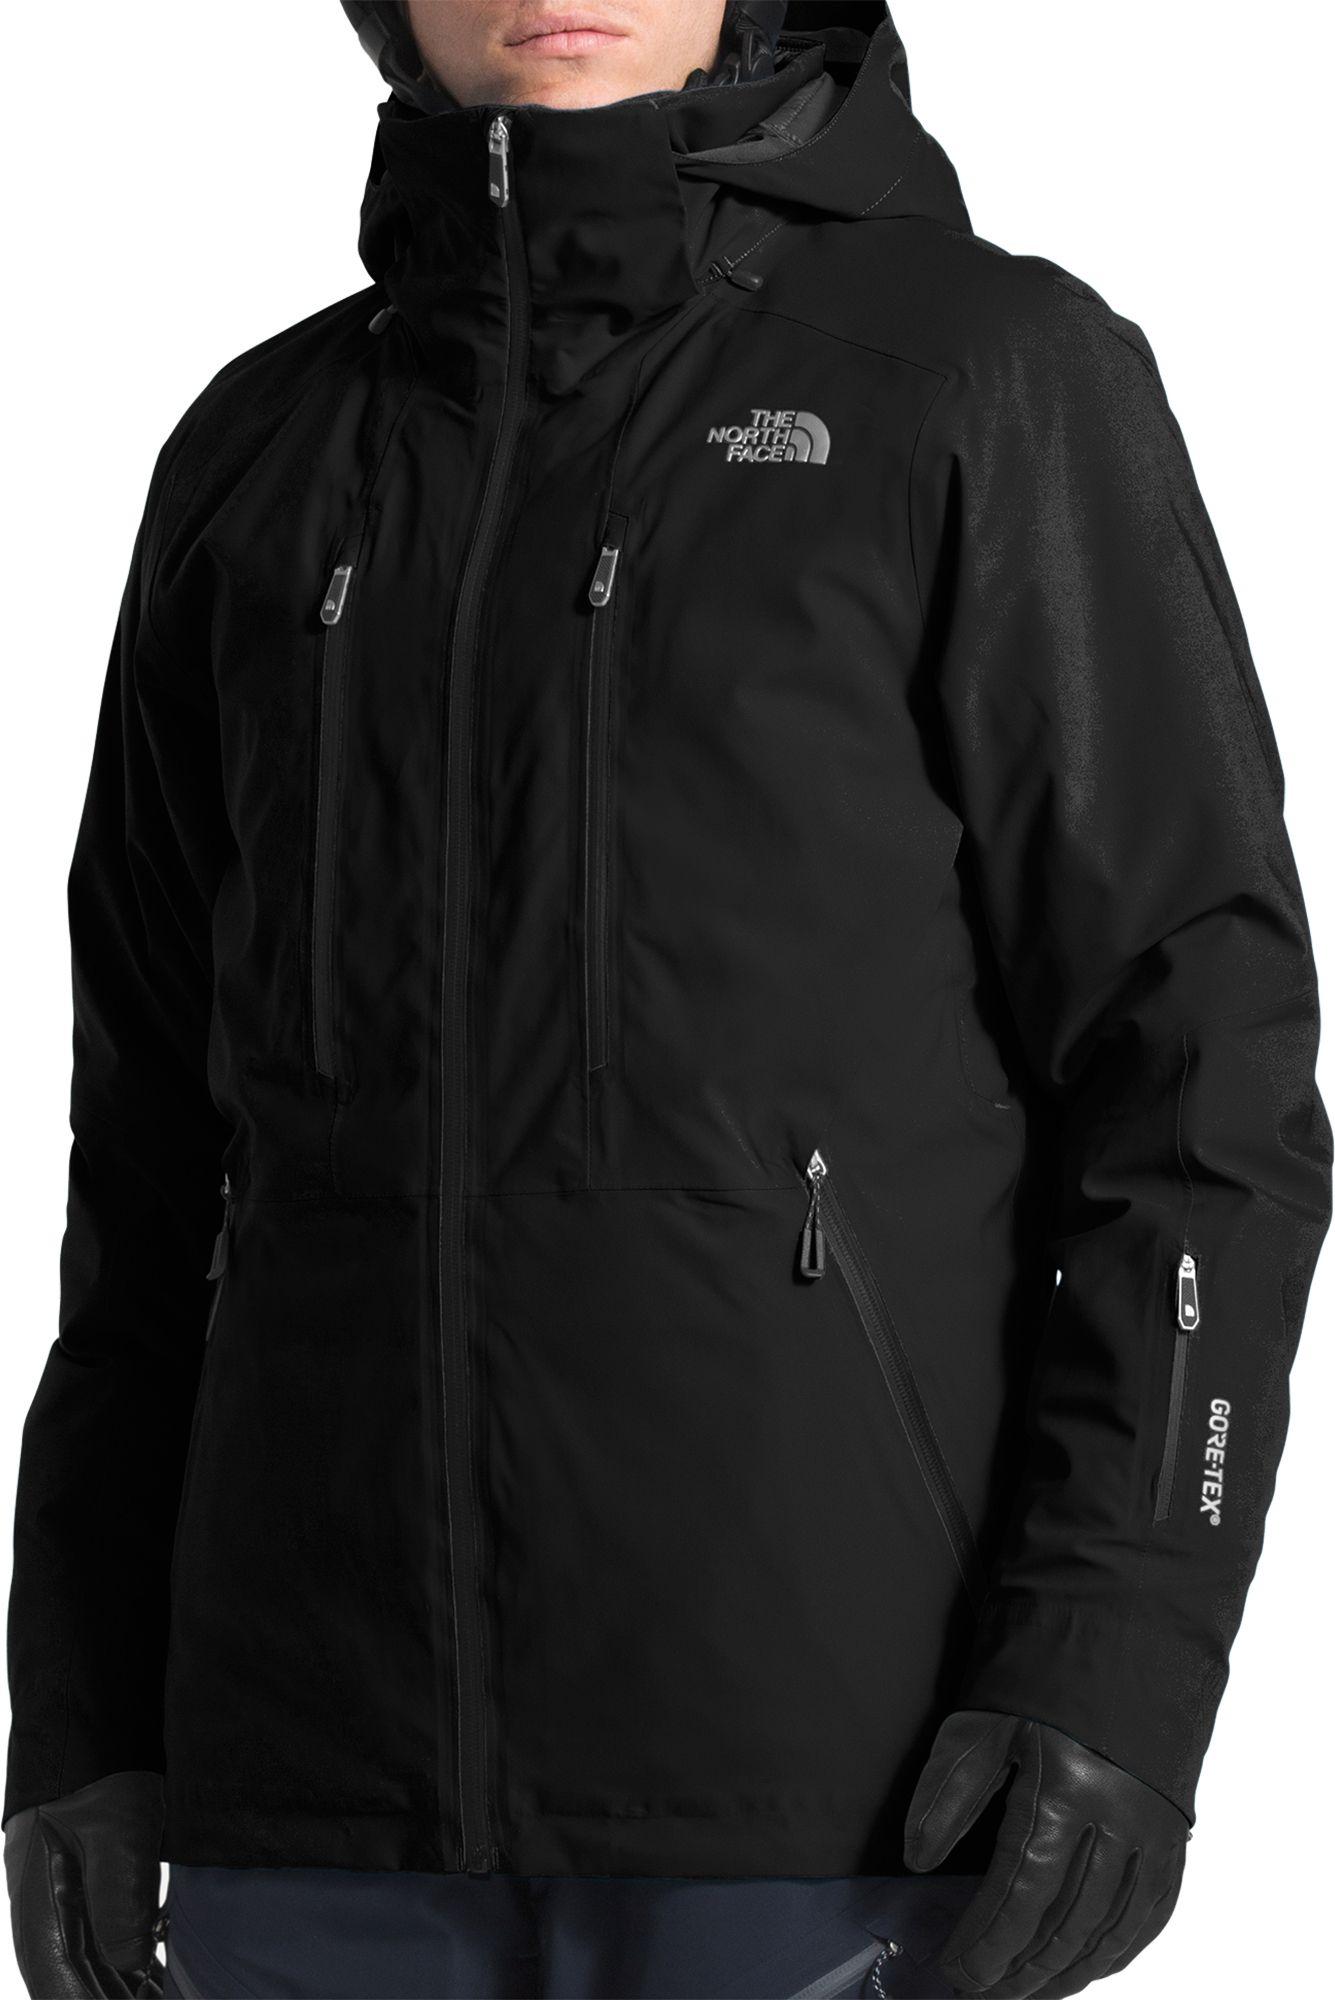 5dd8bda4799e The North Face Men s Anonym Jacket in 2019